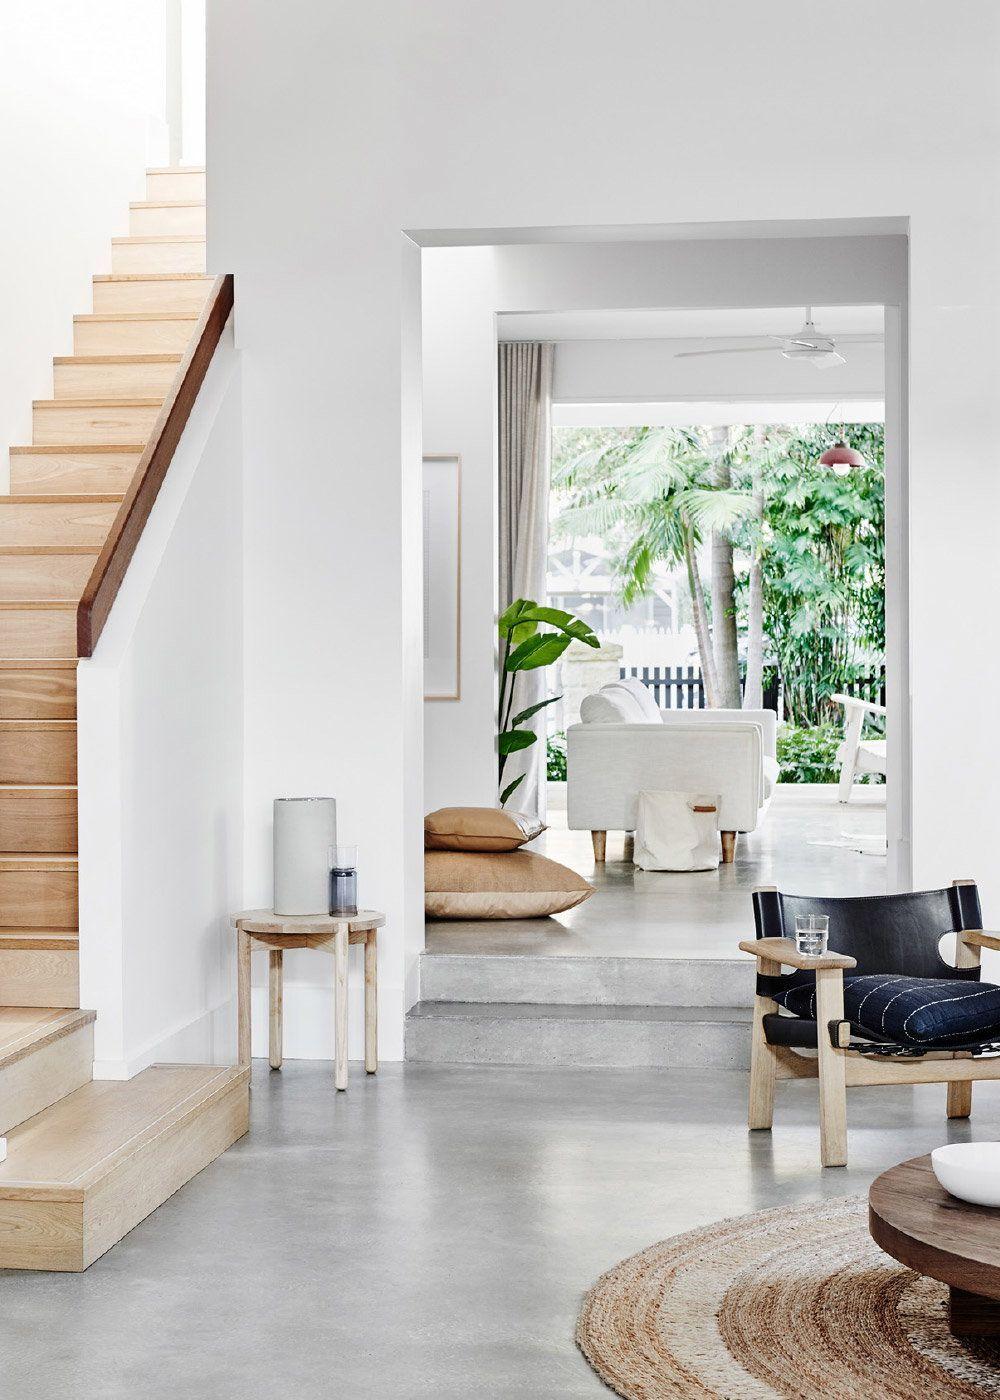 12+ Enchanting Coastal Bedroom Blue Ideas images